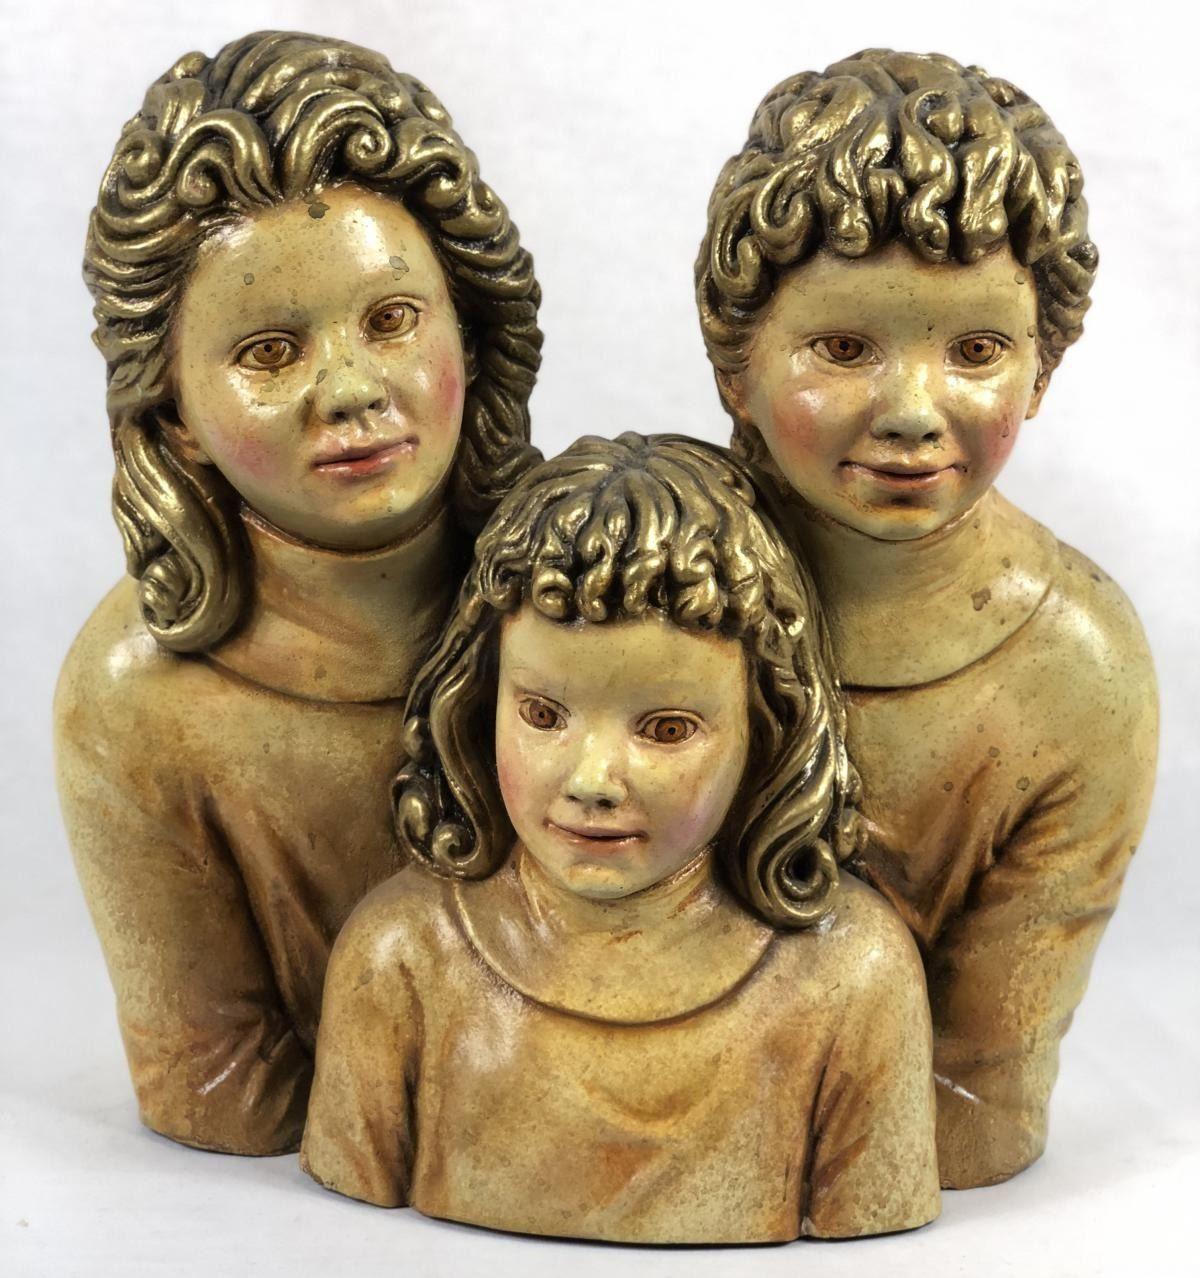 The Haunting 1999 Cherub Busts